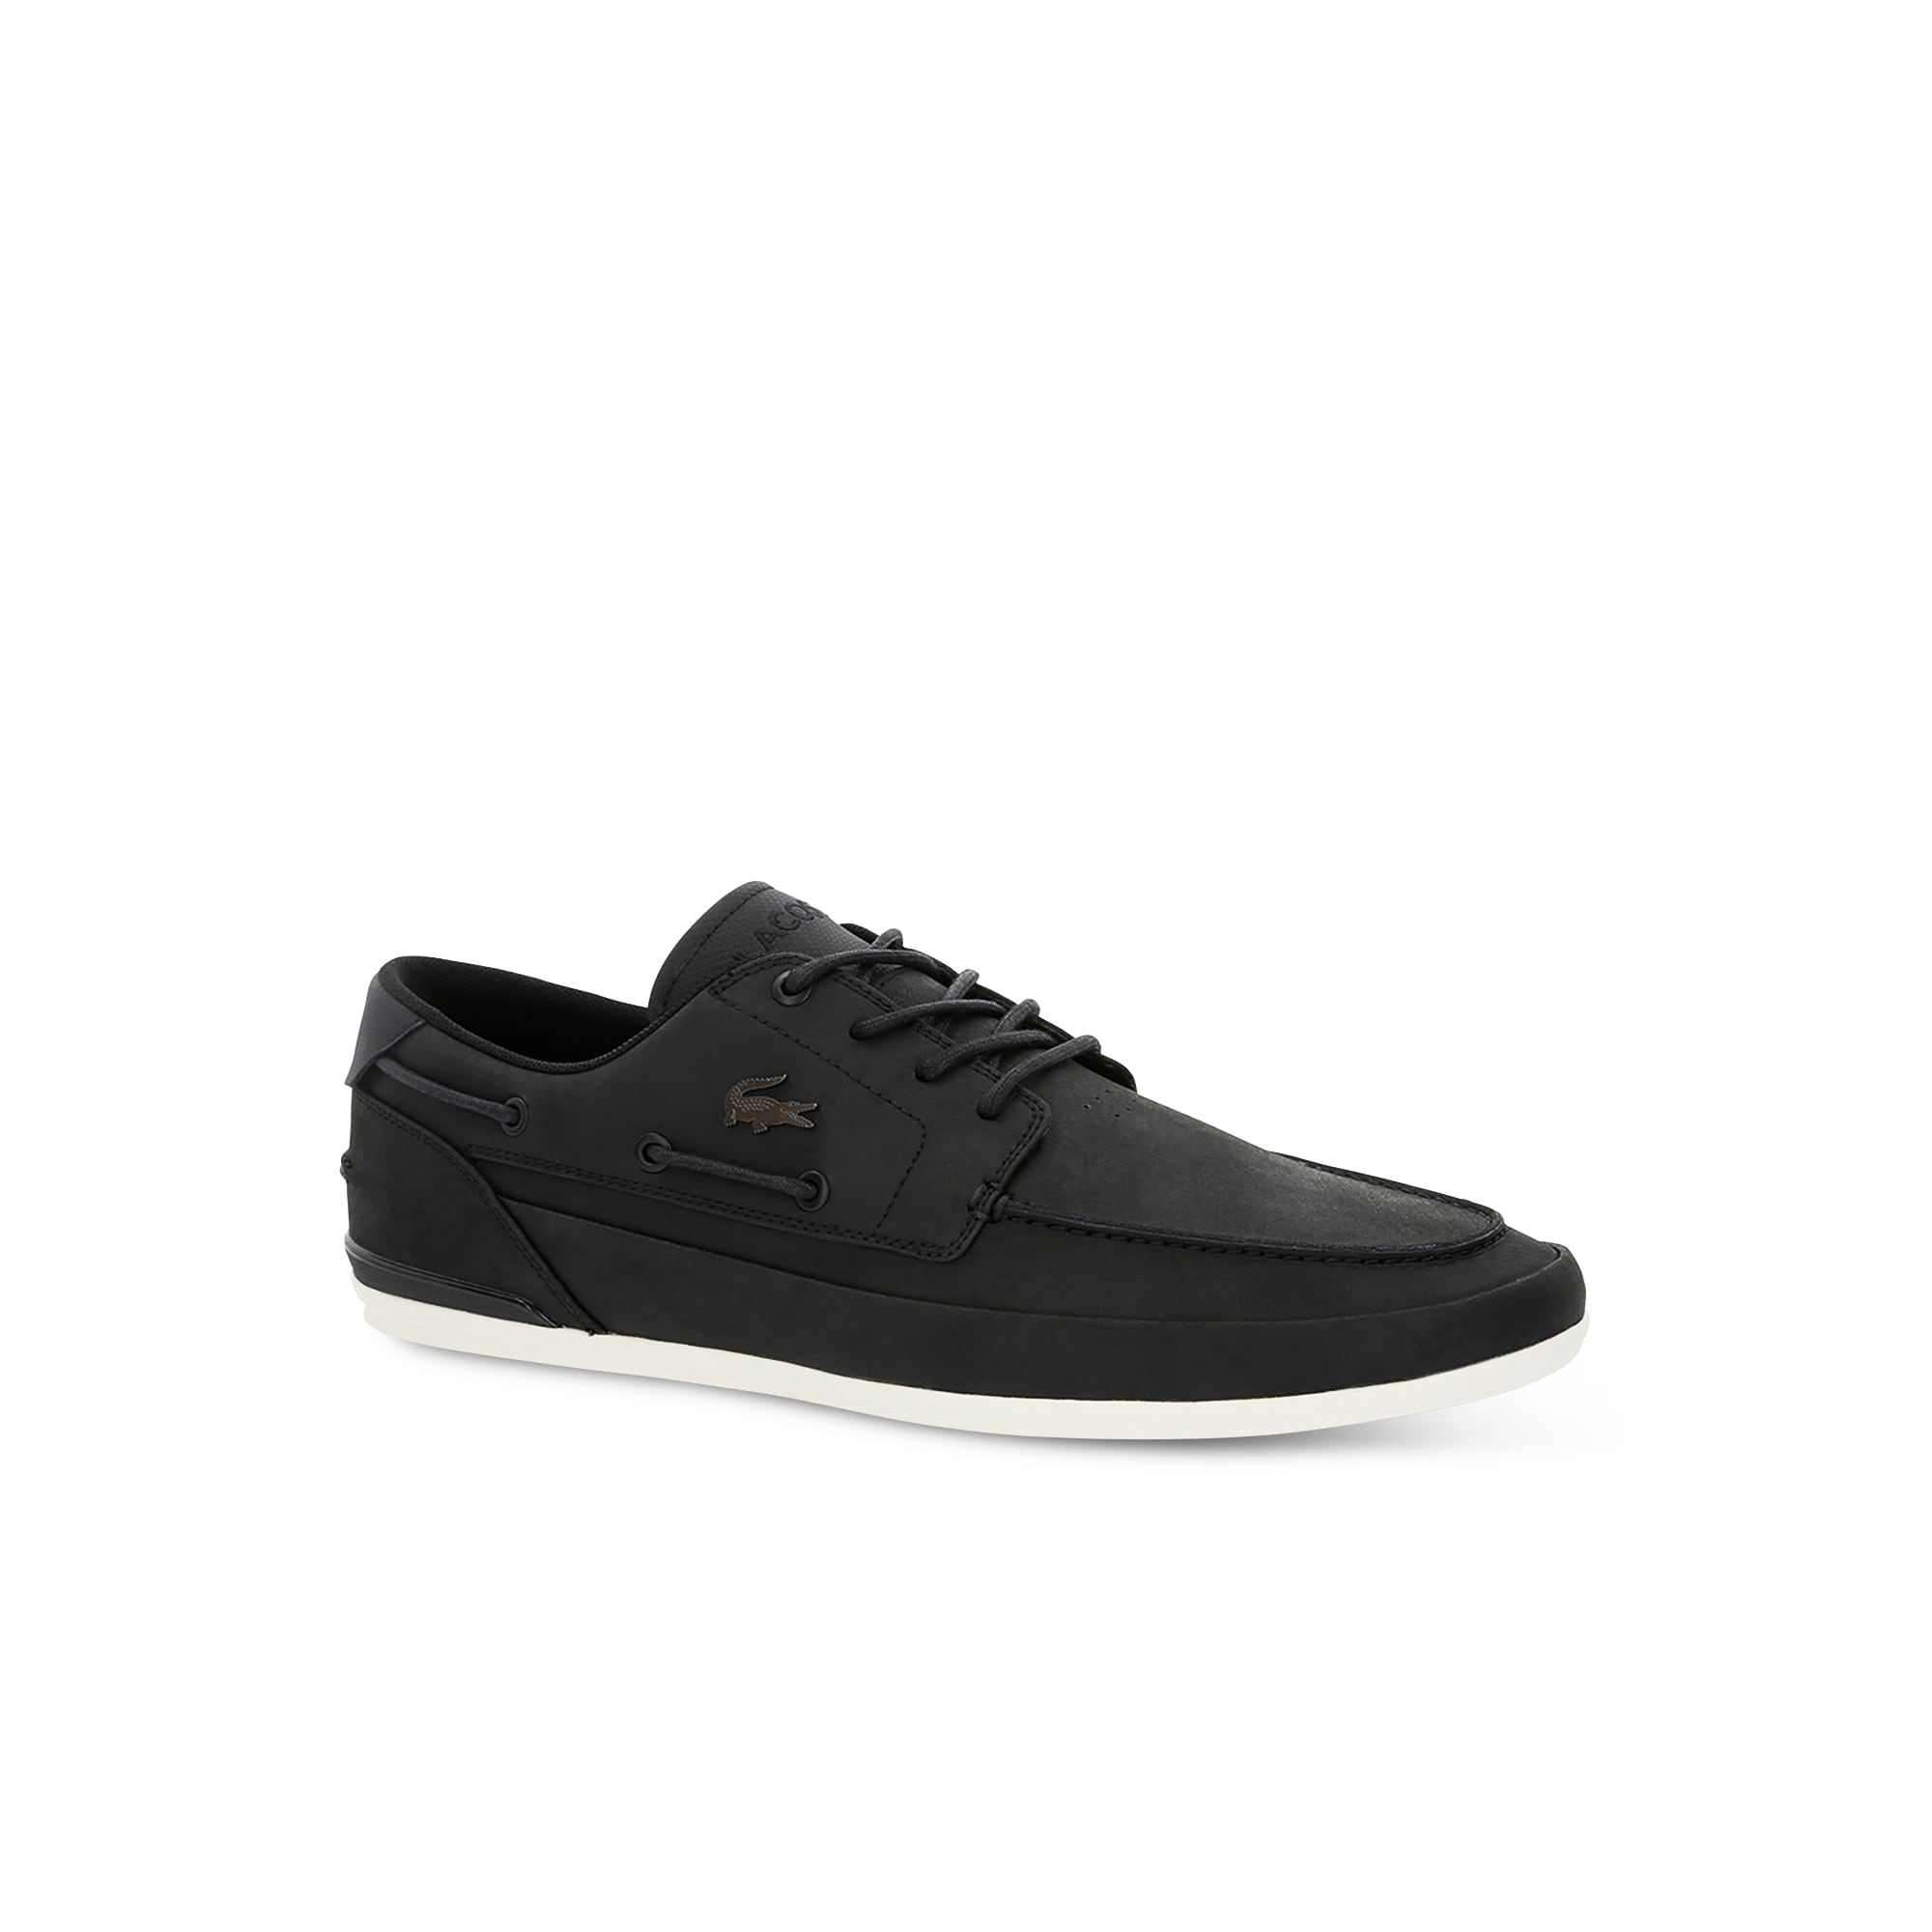 aafaa07eae6cd2 Men s Marina Leather Deck Shoes